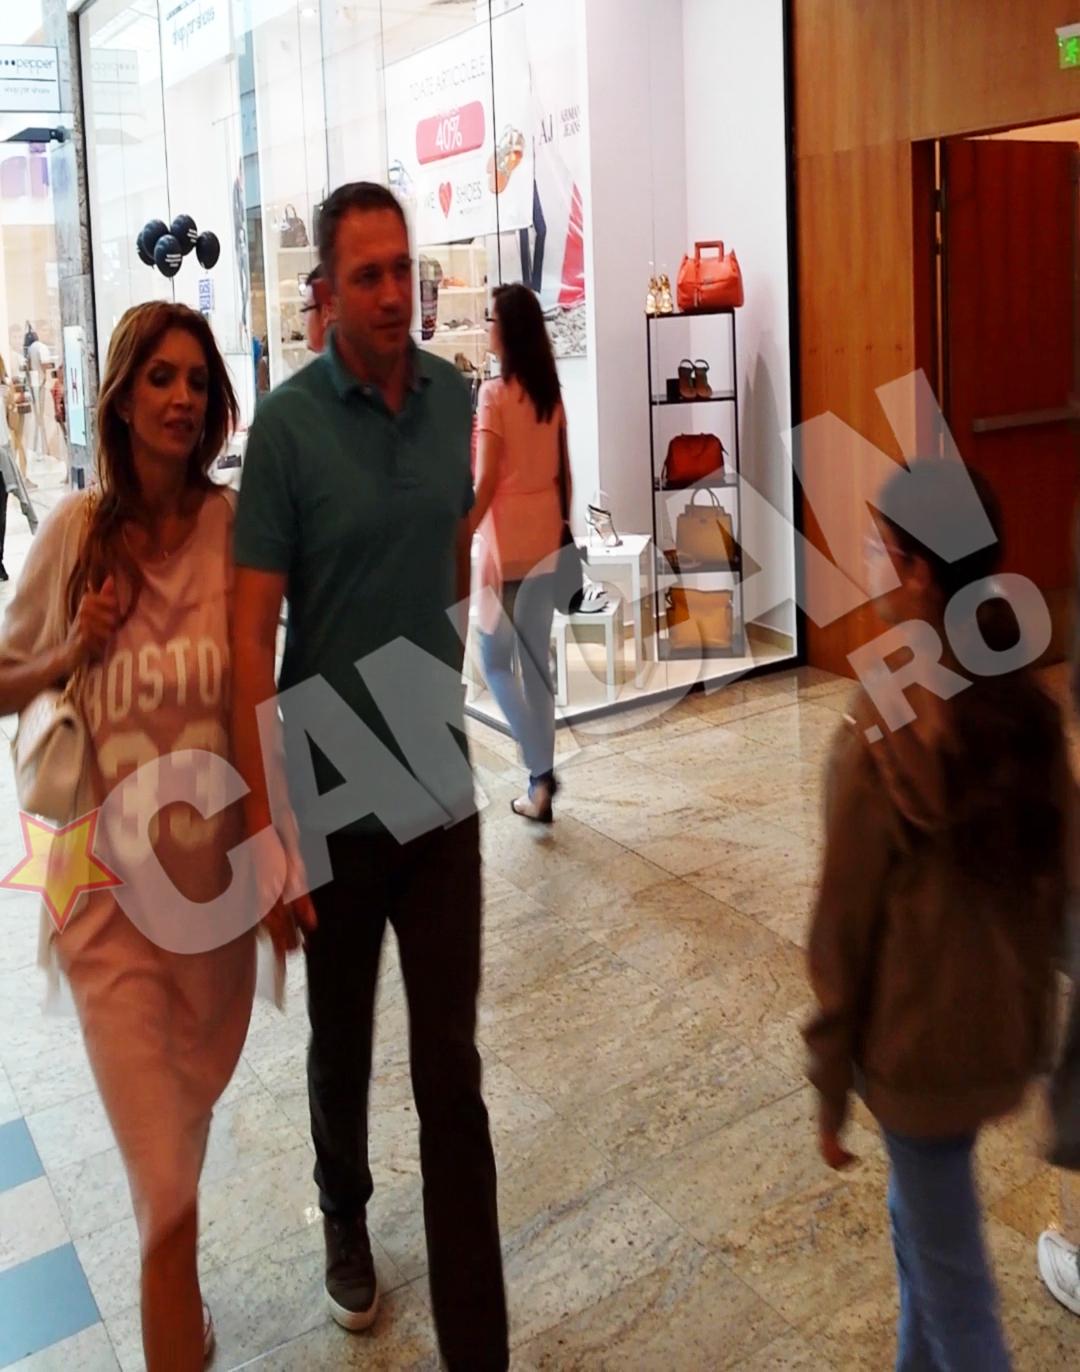 Cristina si sotul ei s-au tinut de mana aproape tot timpul cat s-au plimbat prin mall